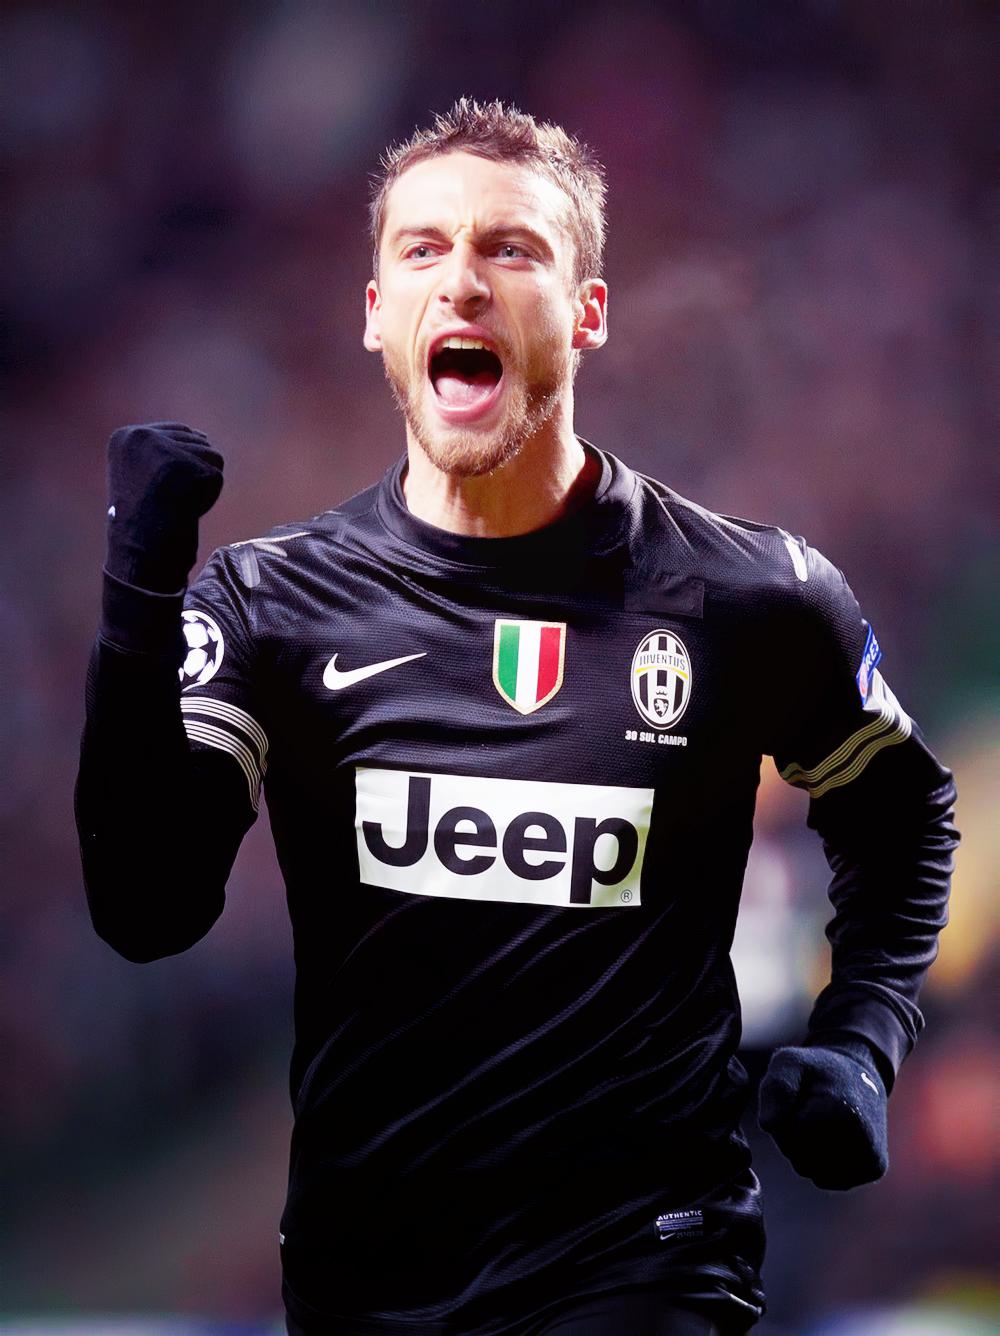 marchisio - photo #6